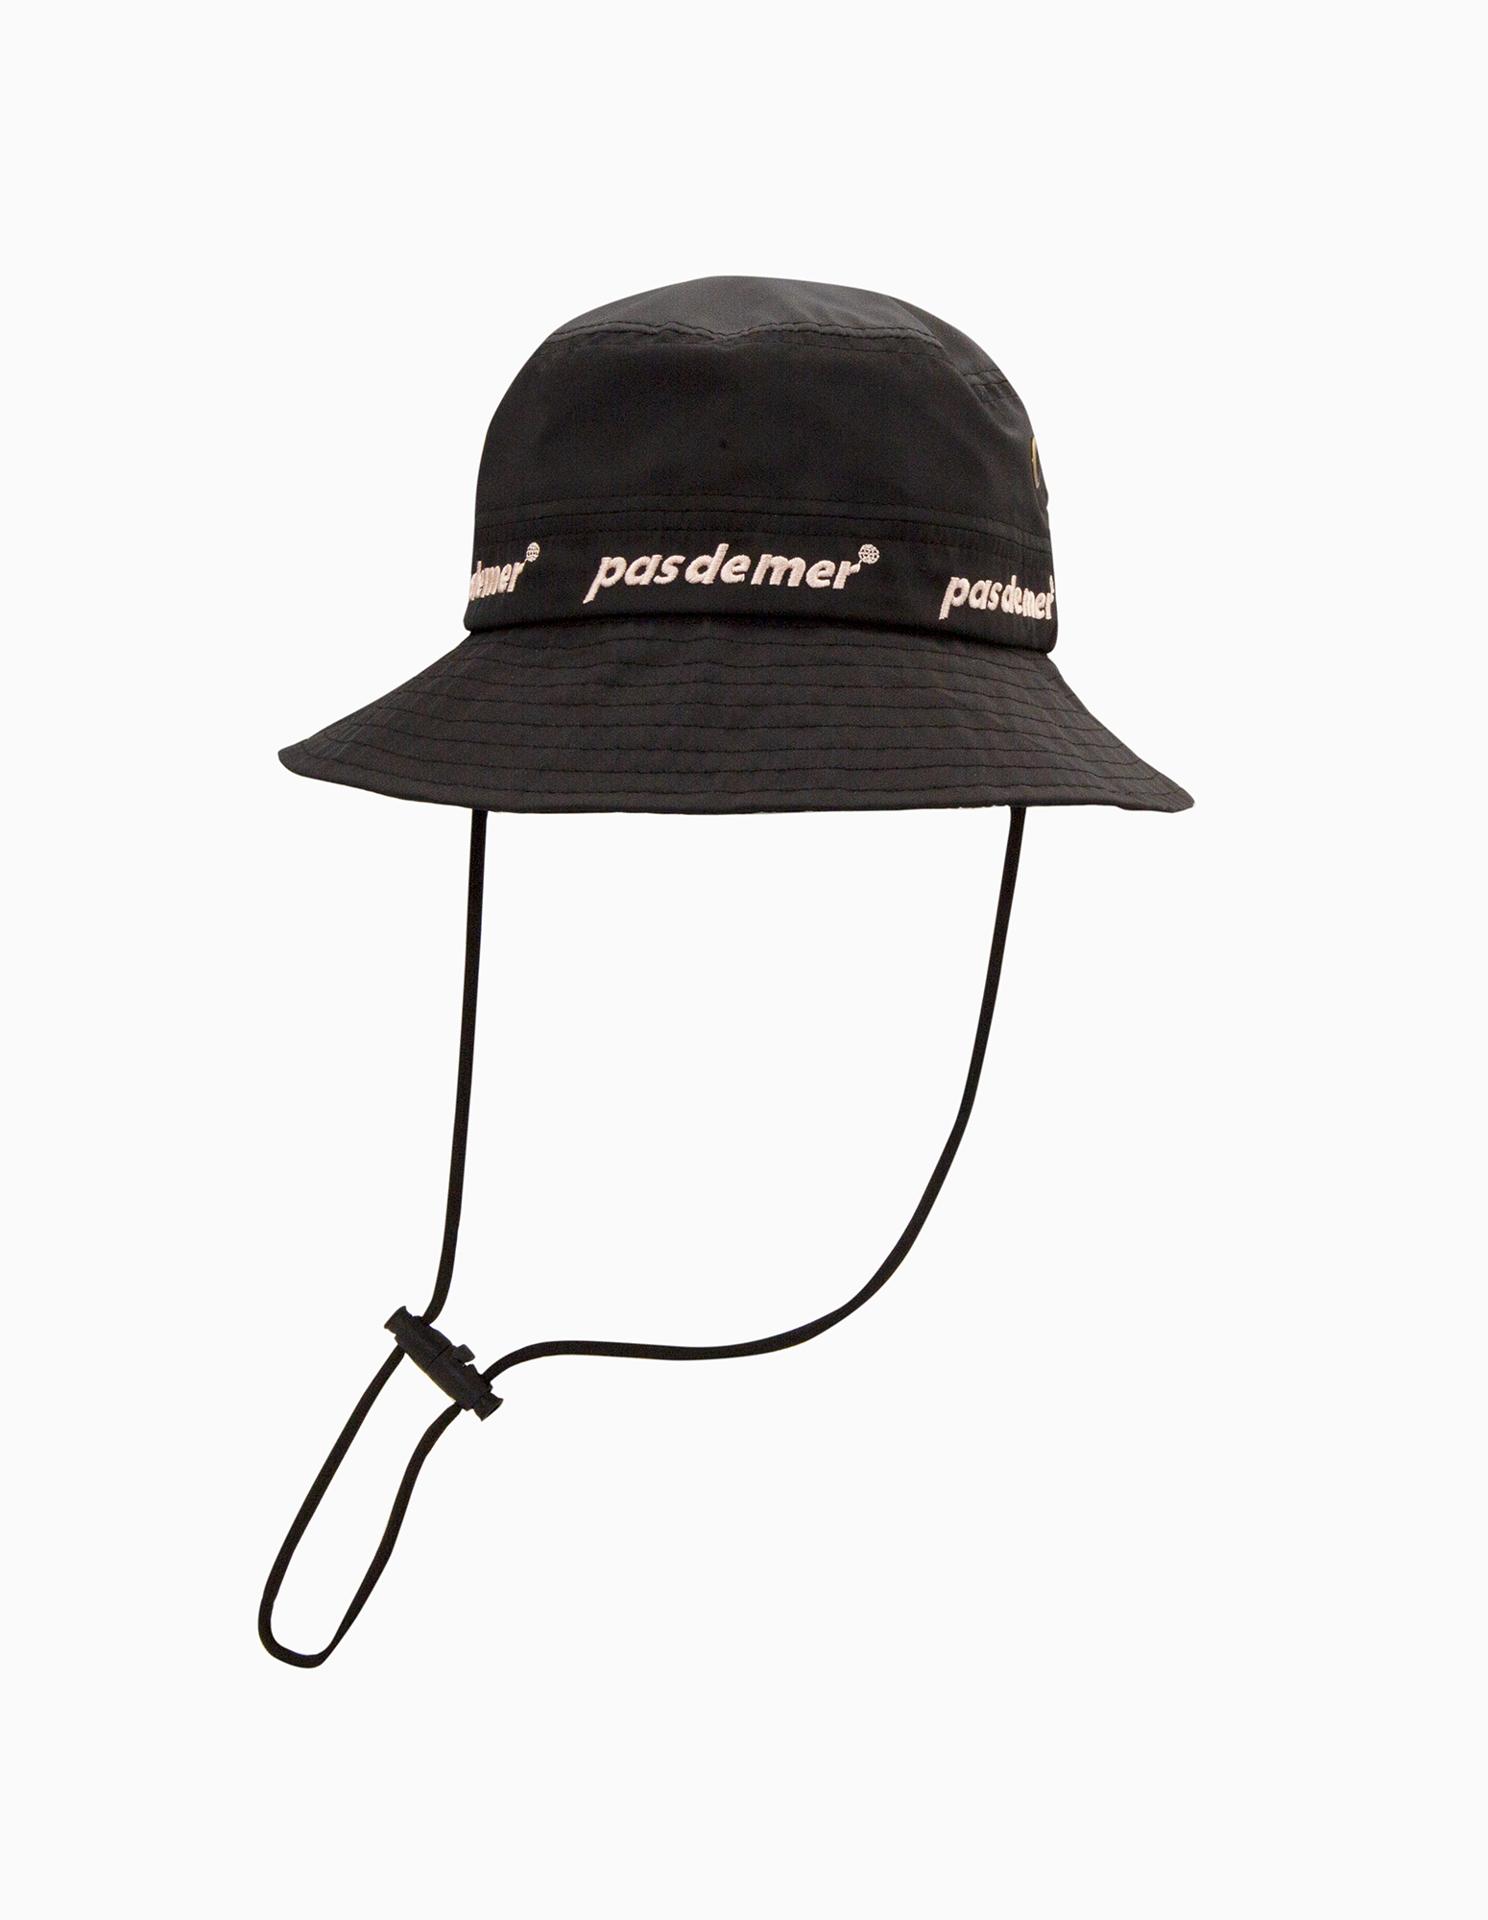 【PAS DE MER/パドゥメ】SUBURB BUCKET HAT キャップ / BLACK